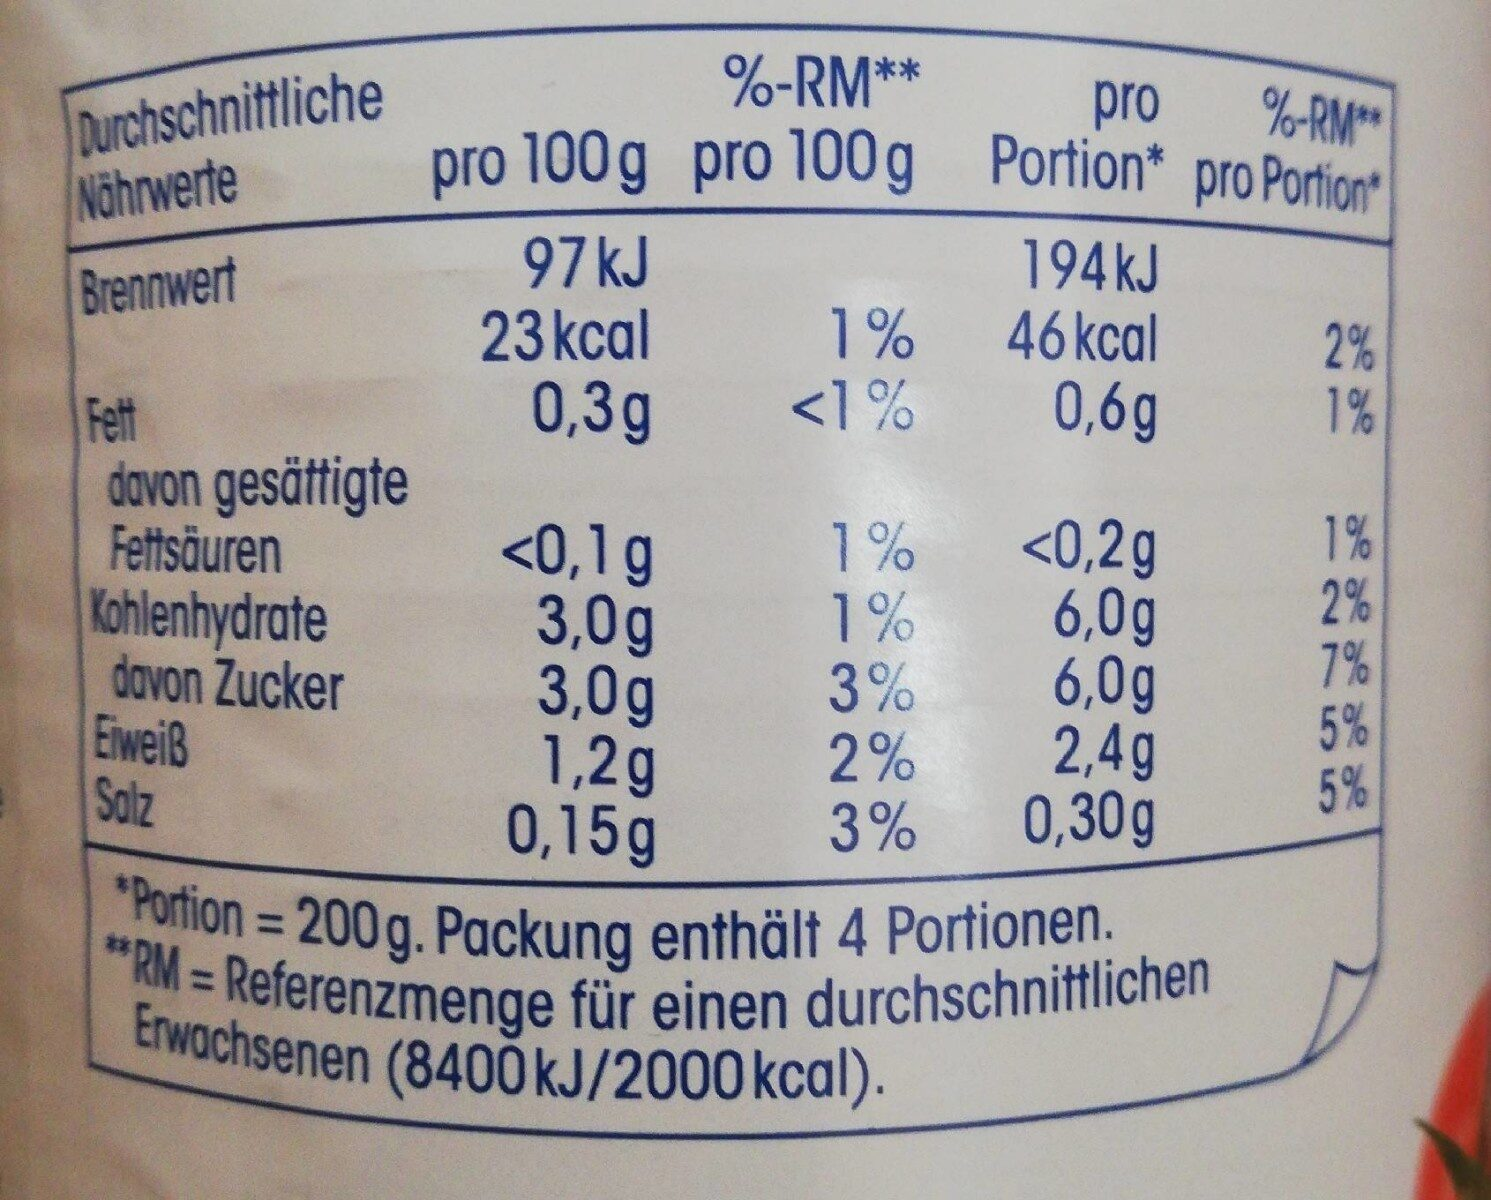 Geschälte Tomaten in Tomatensaft - Nährwertangaben - de